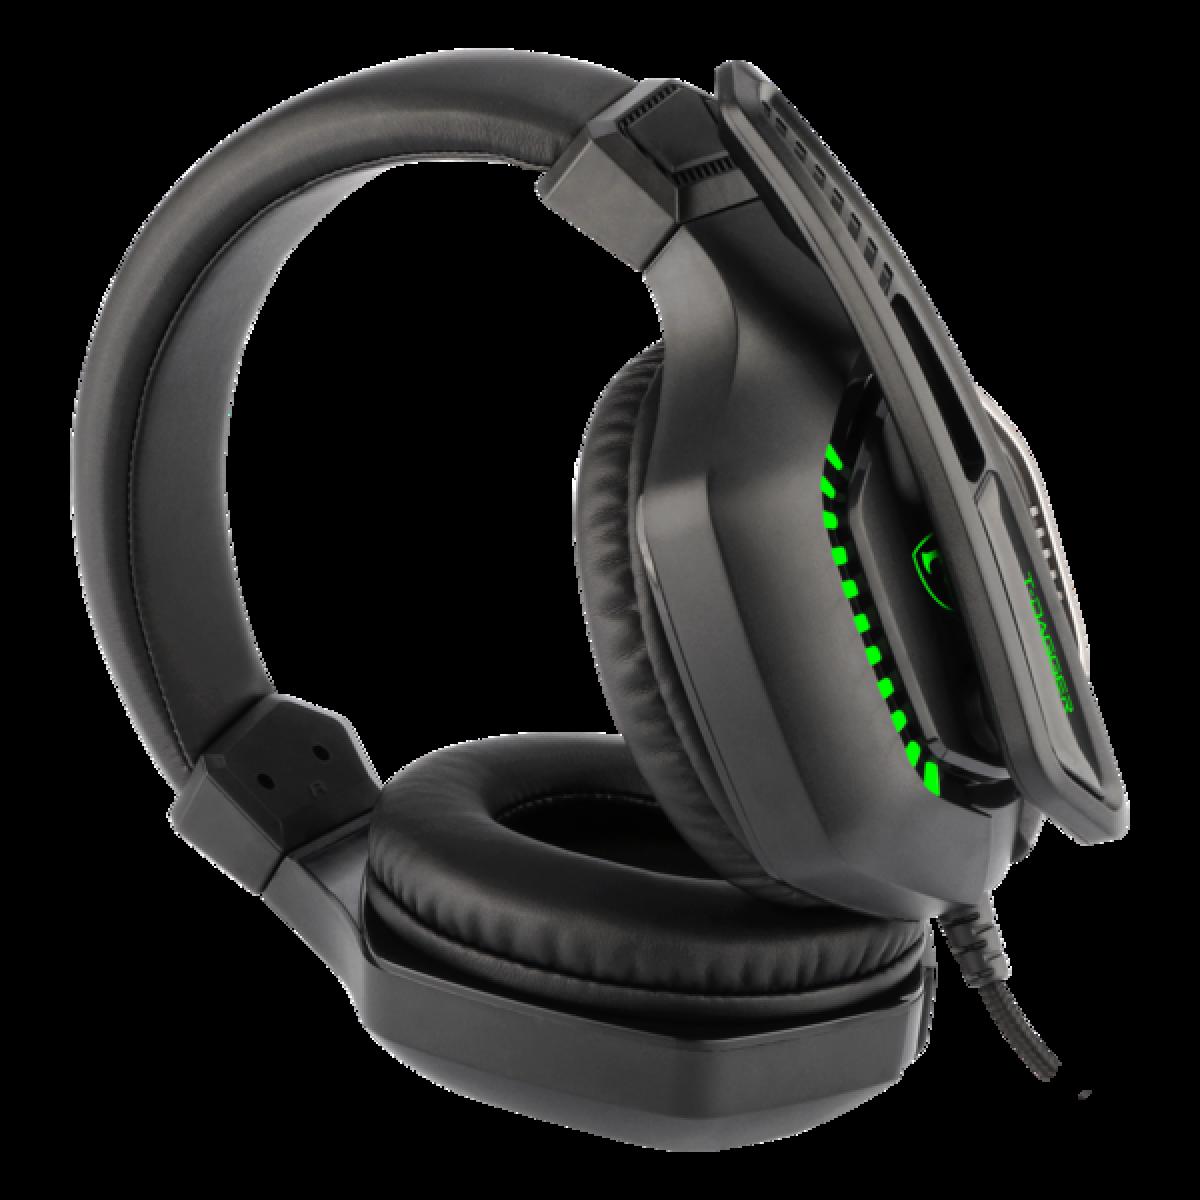 Headset Gamer T-Dagger Eiger, 3.5mm + USB, Green, T-RGH208